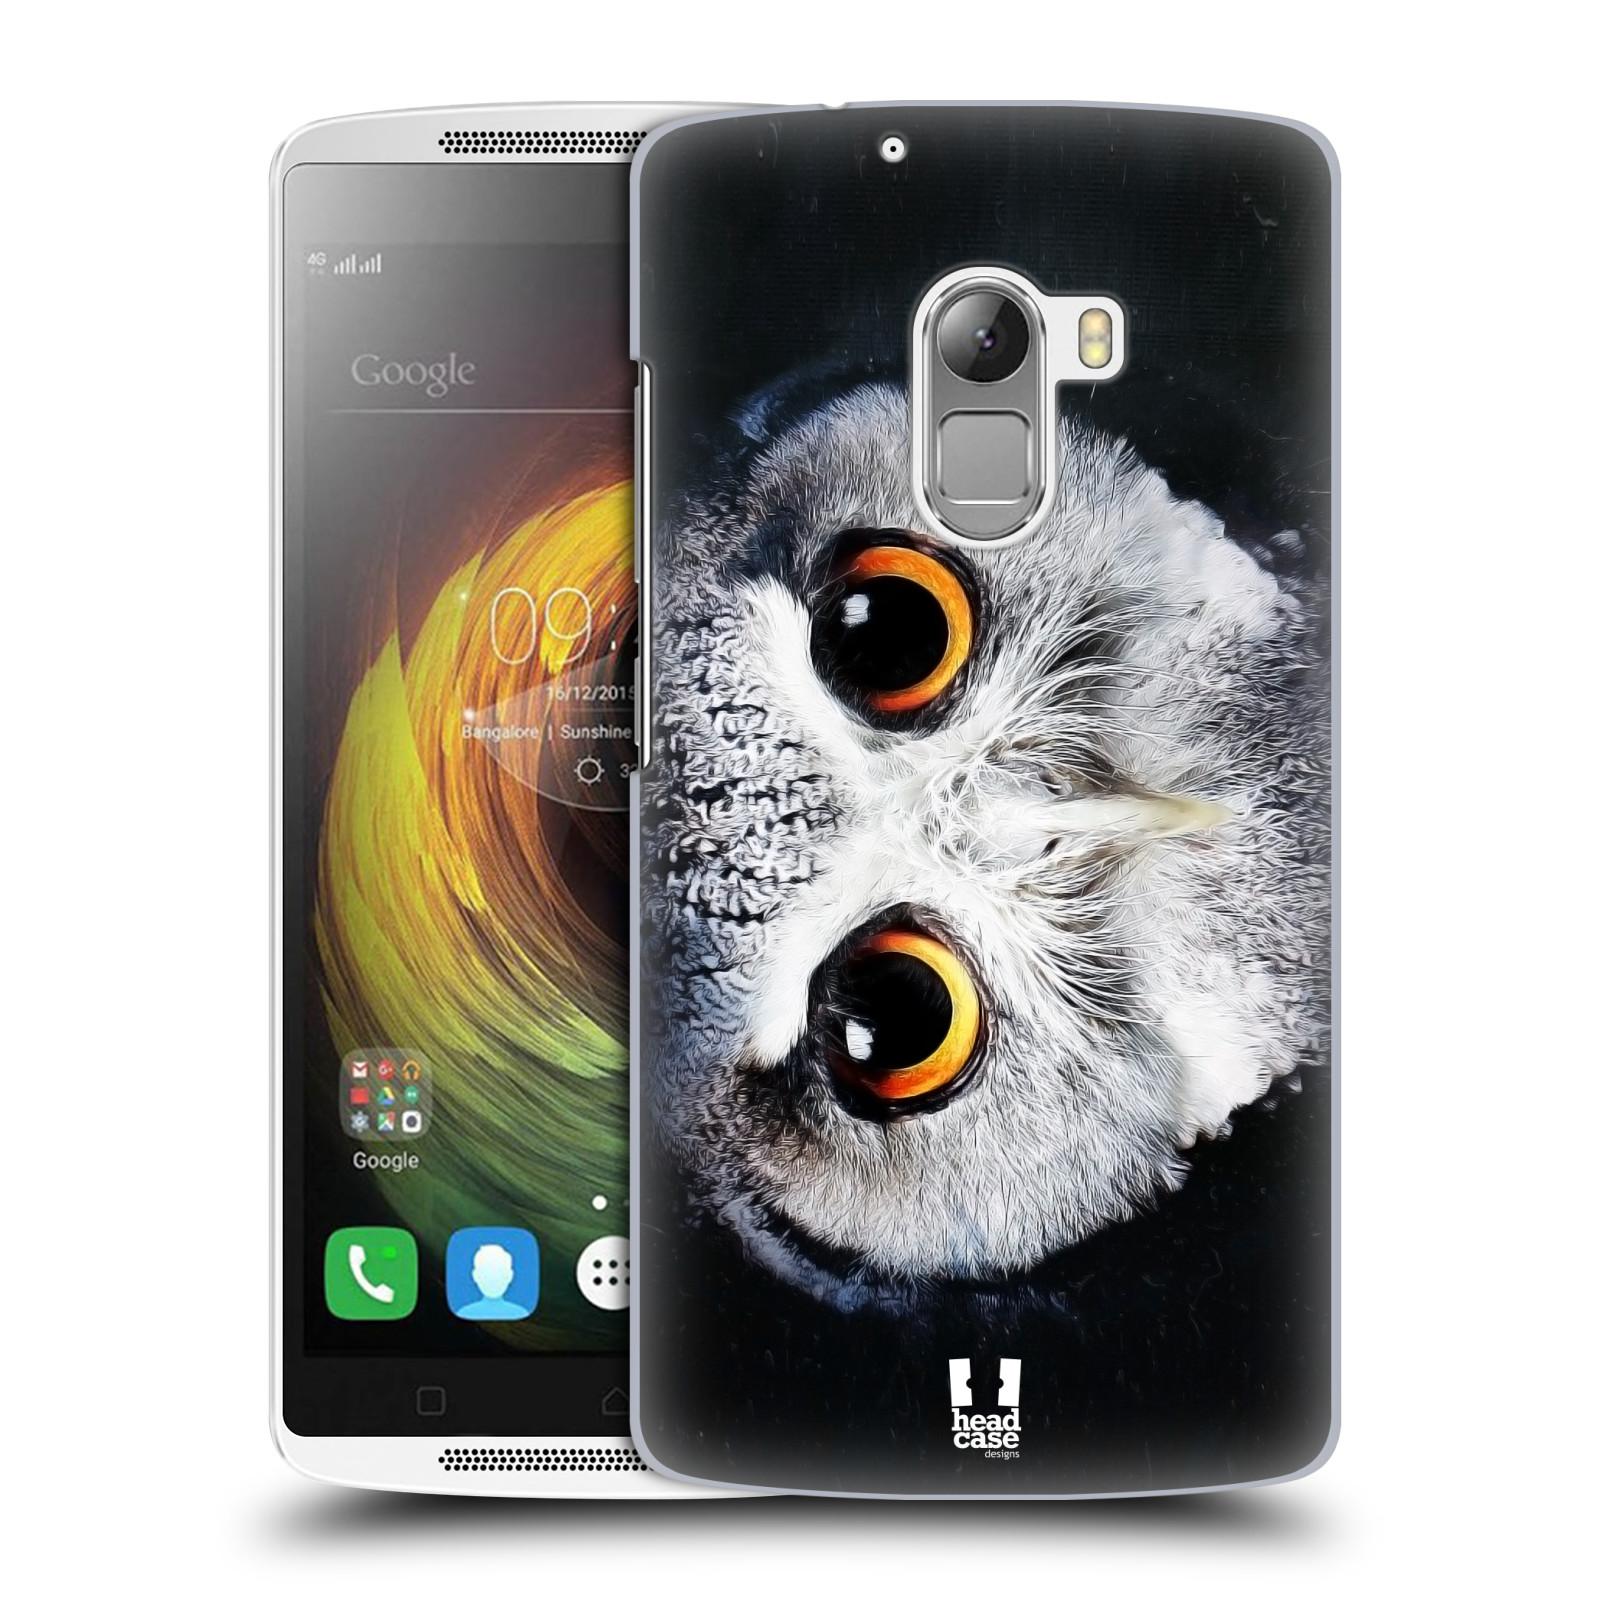 HEAD CASE pevný plastový obal na mobil LENOVO A7010 / A7010 DUAL / K4 Note / Vibe X3 lite vzor Zvířecí tváře sova